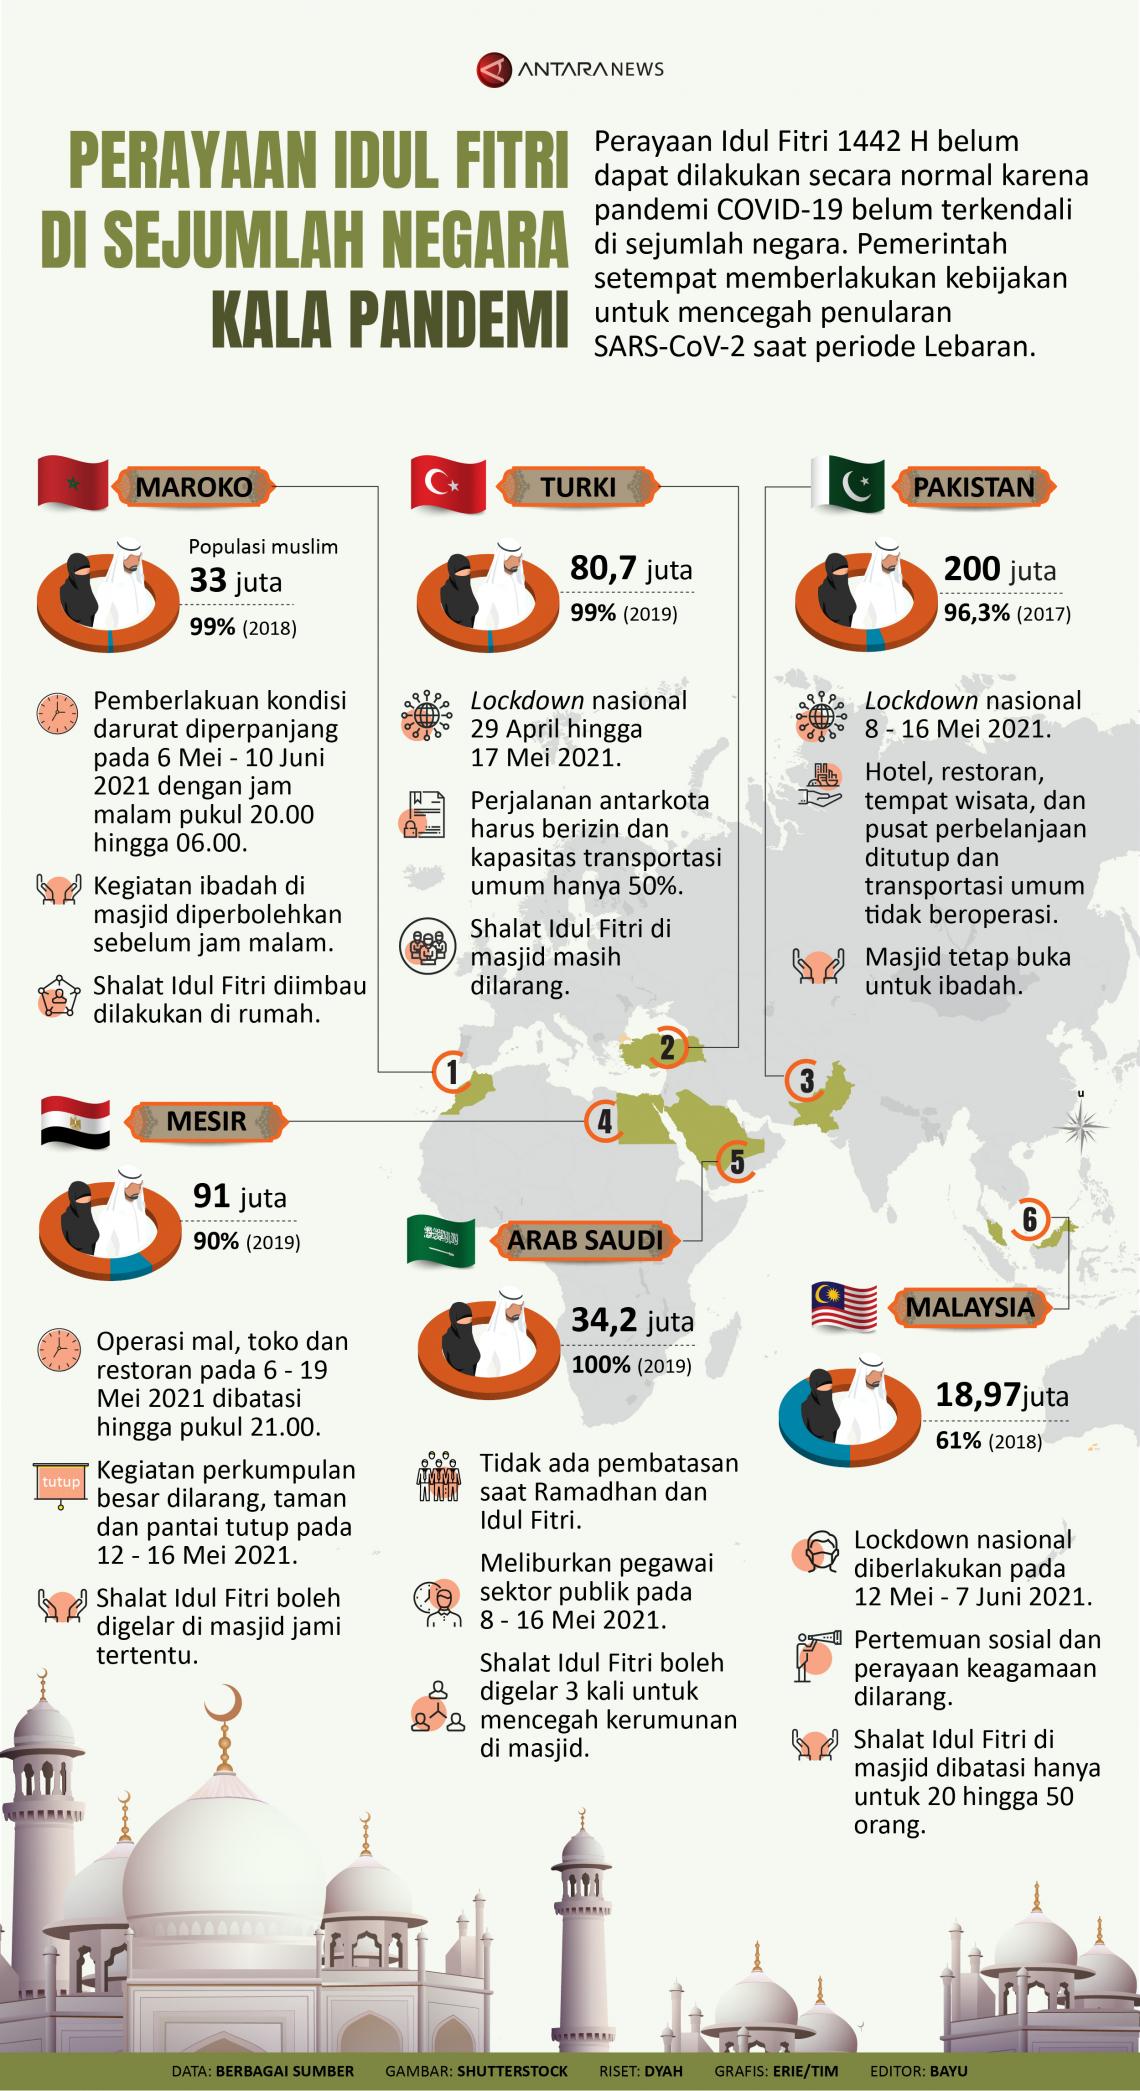 Idul Fitri di sejumlah negara kala pandemi